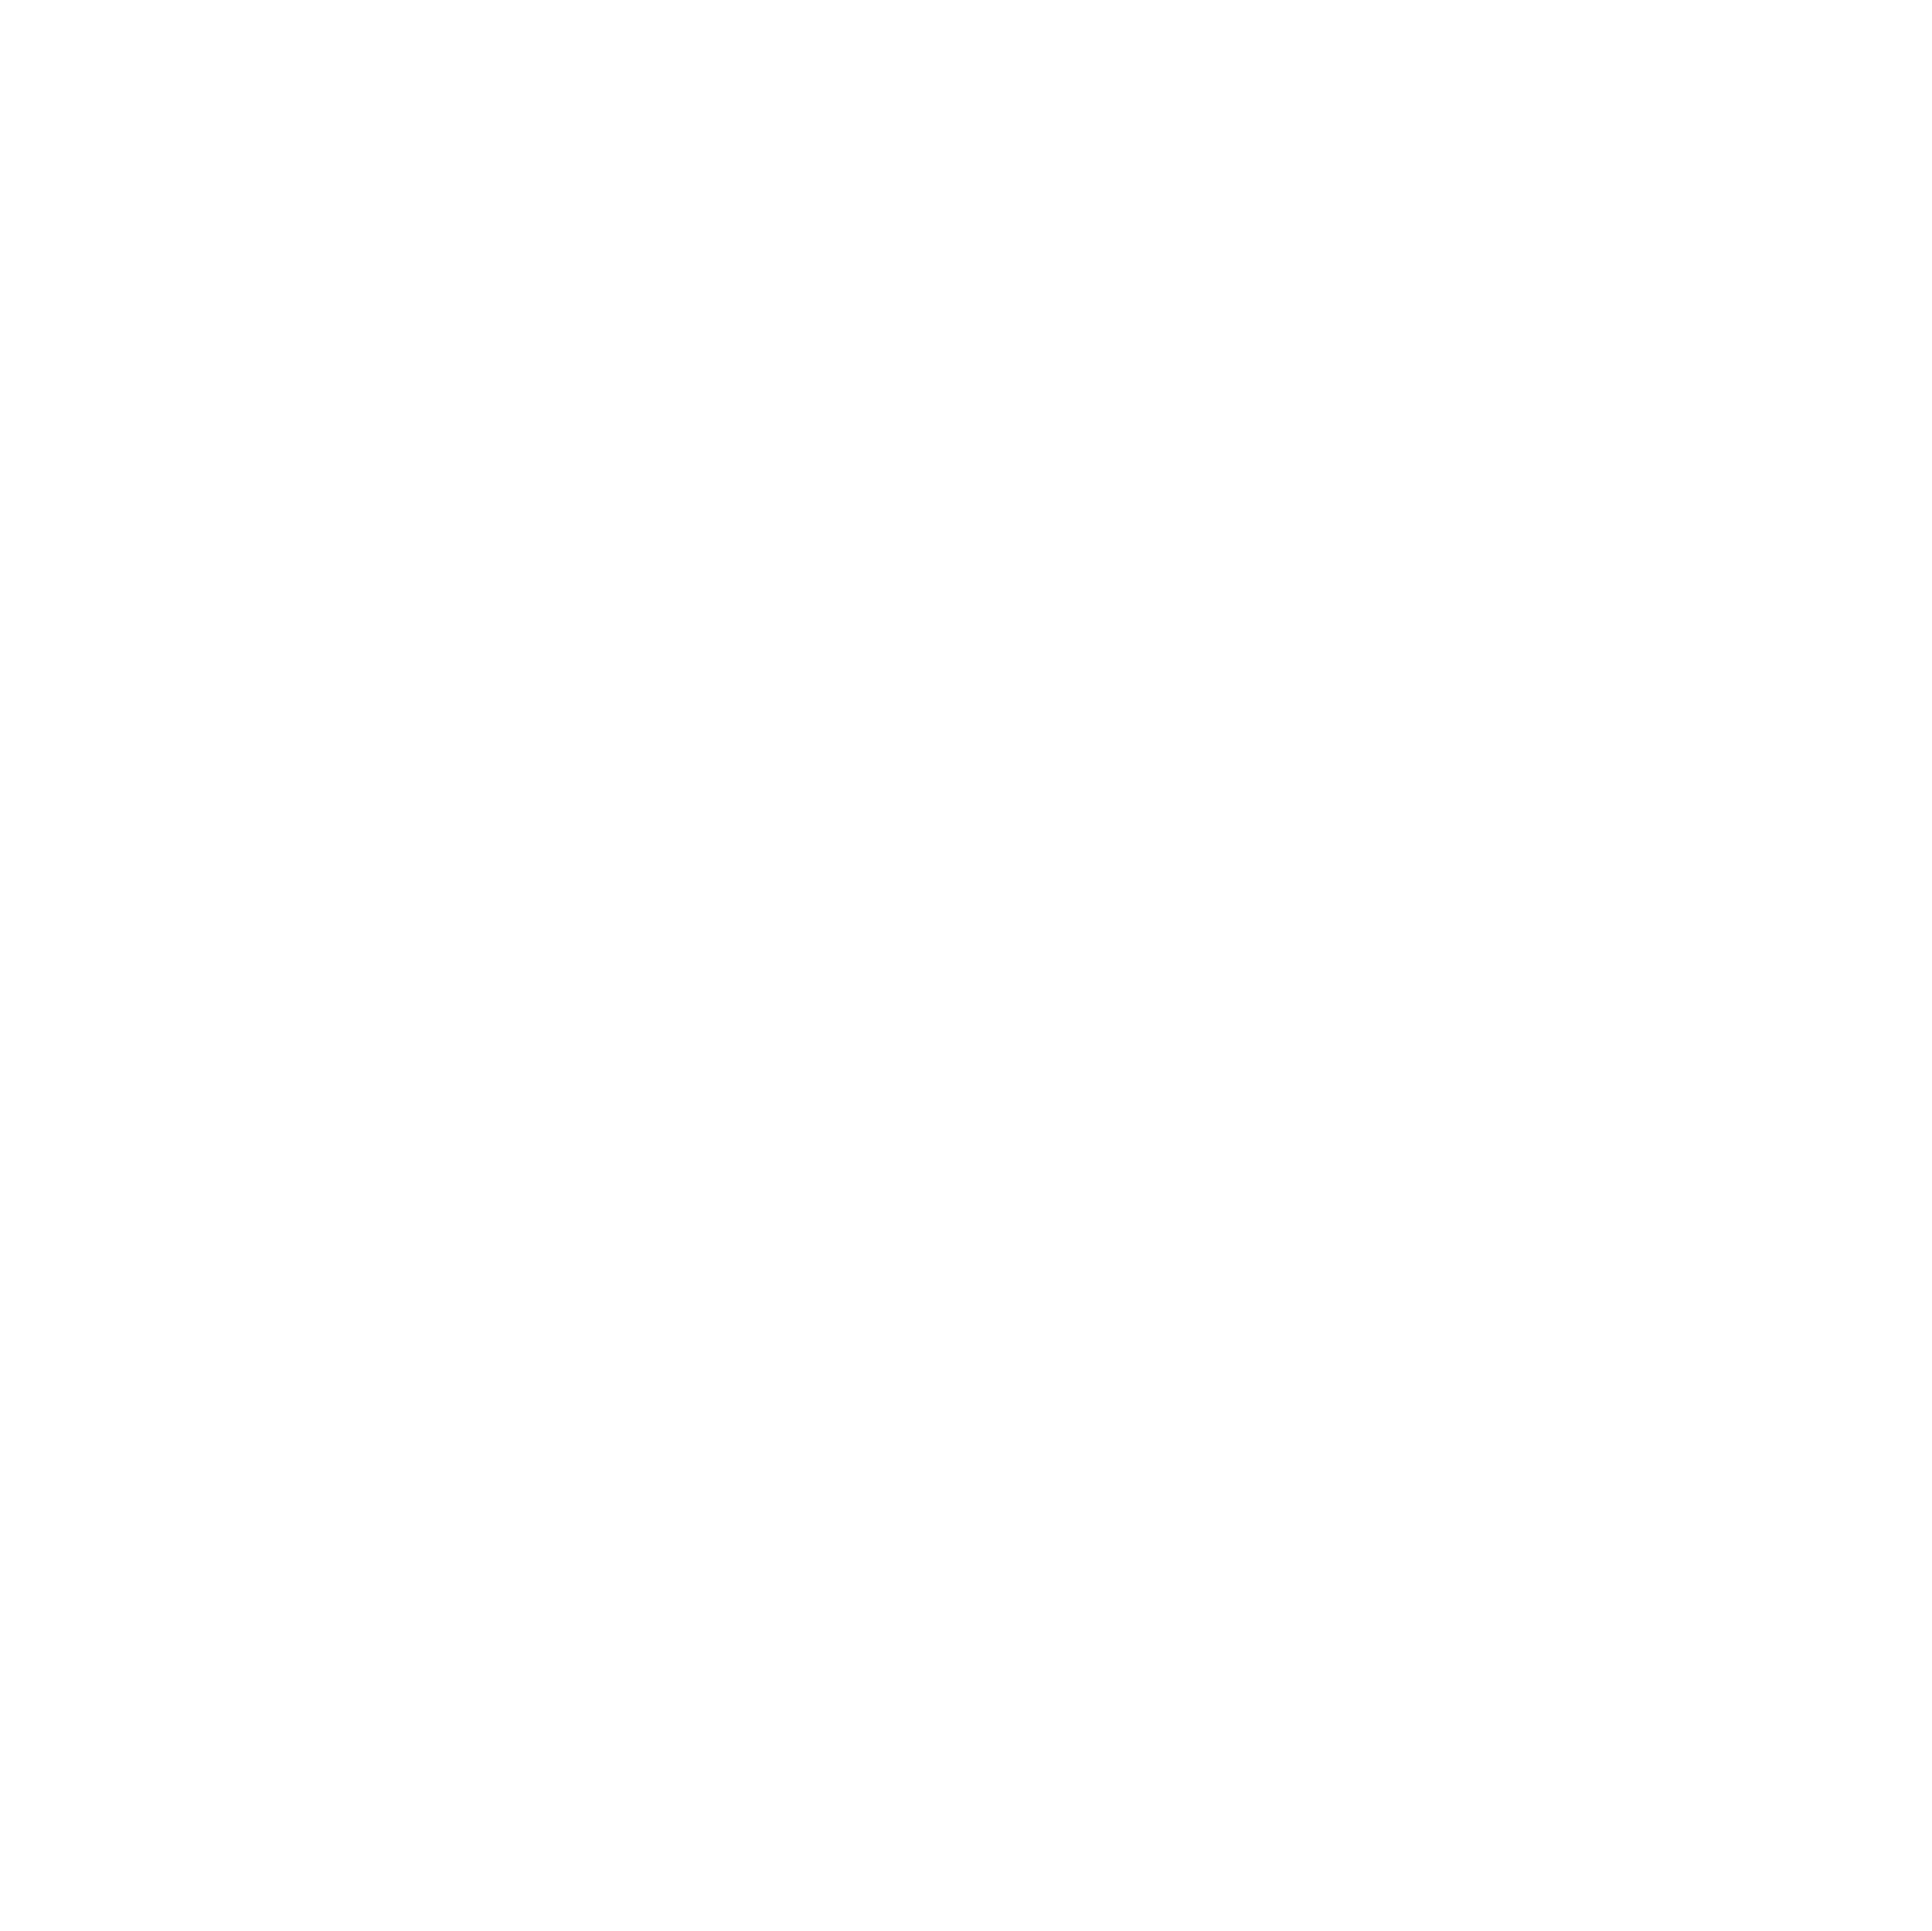 Alxedo Bird Logo in white